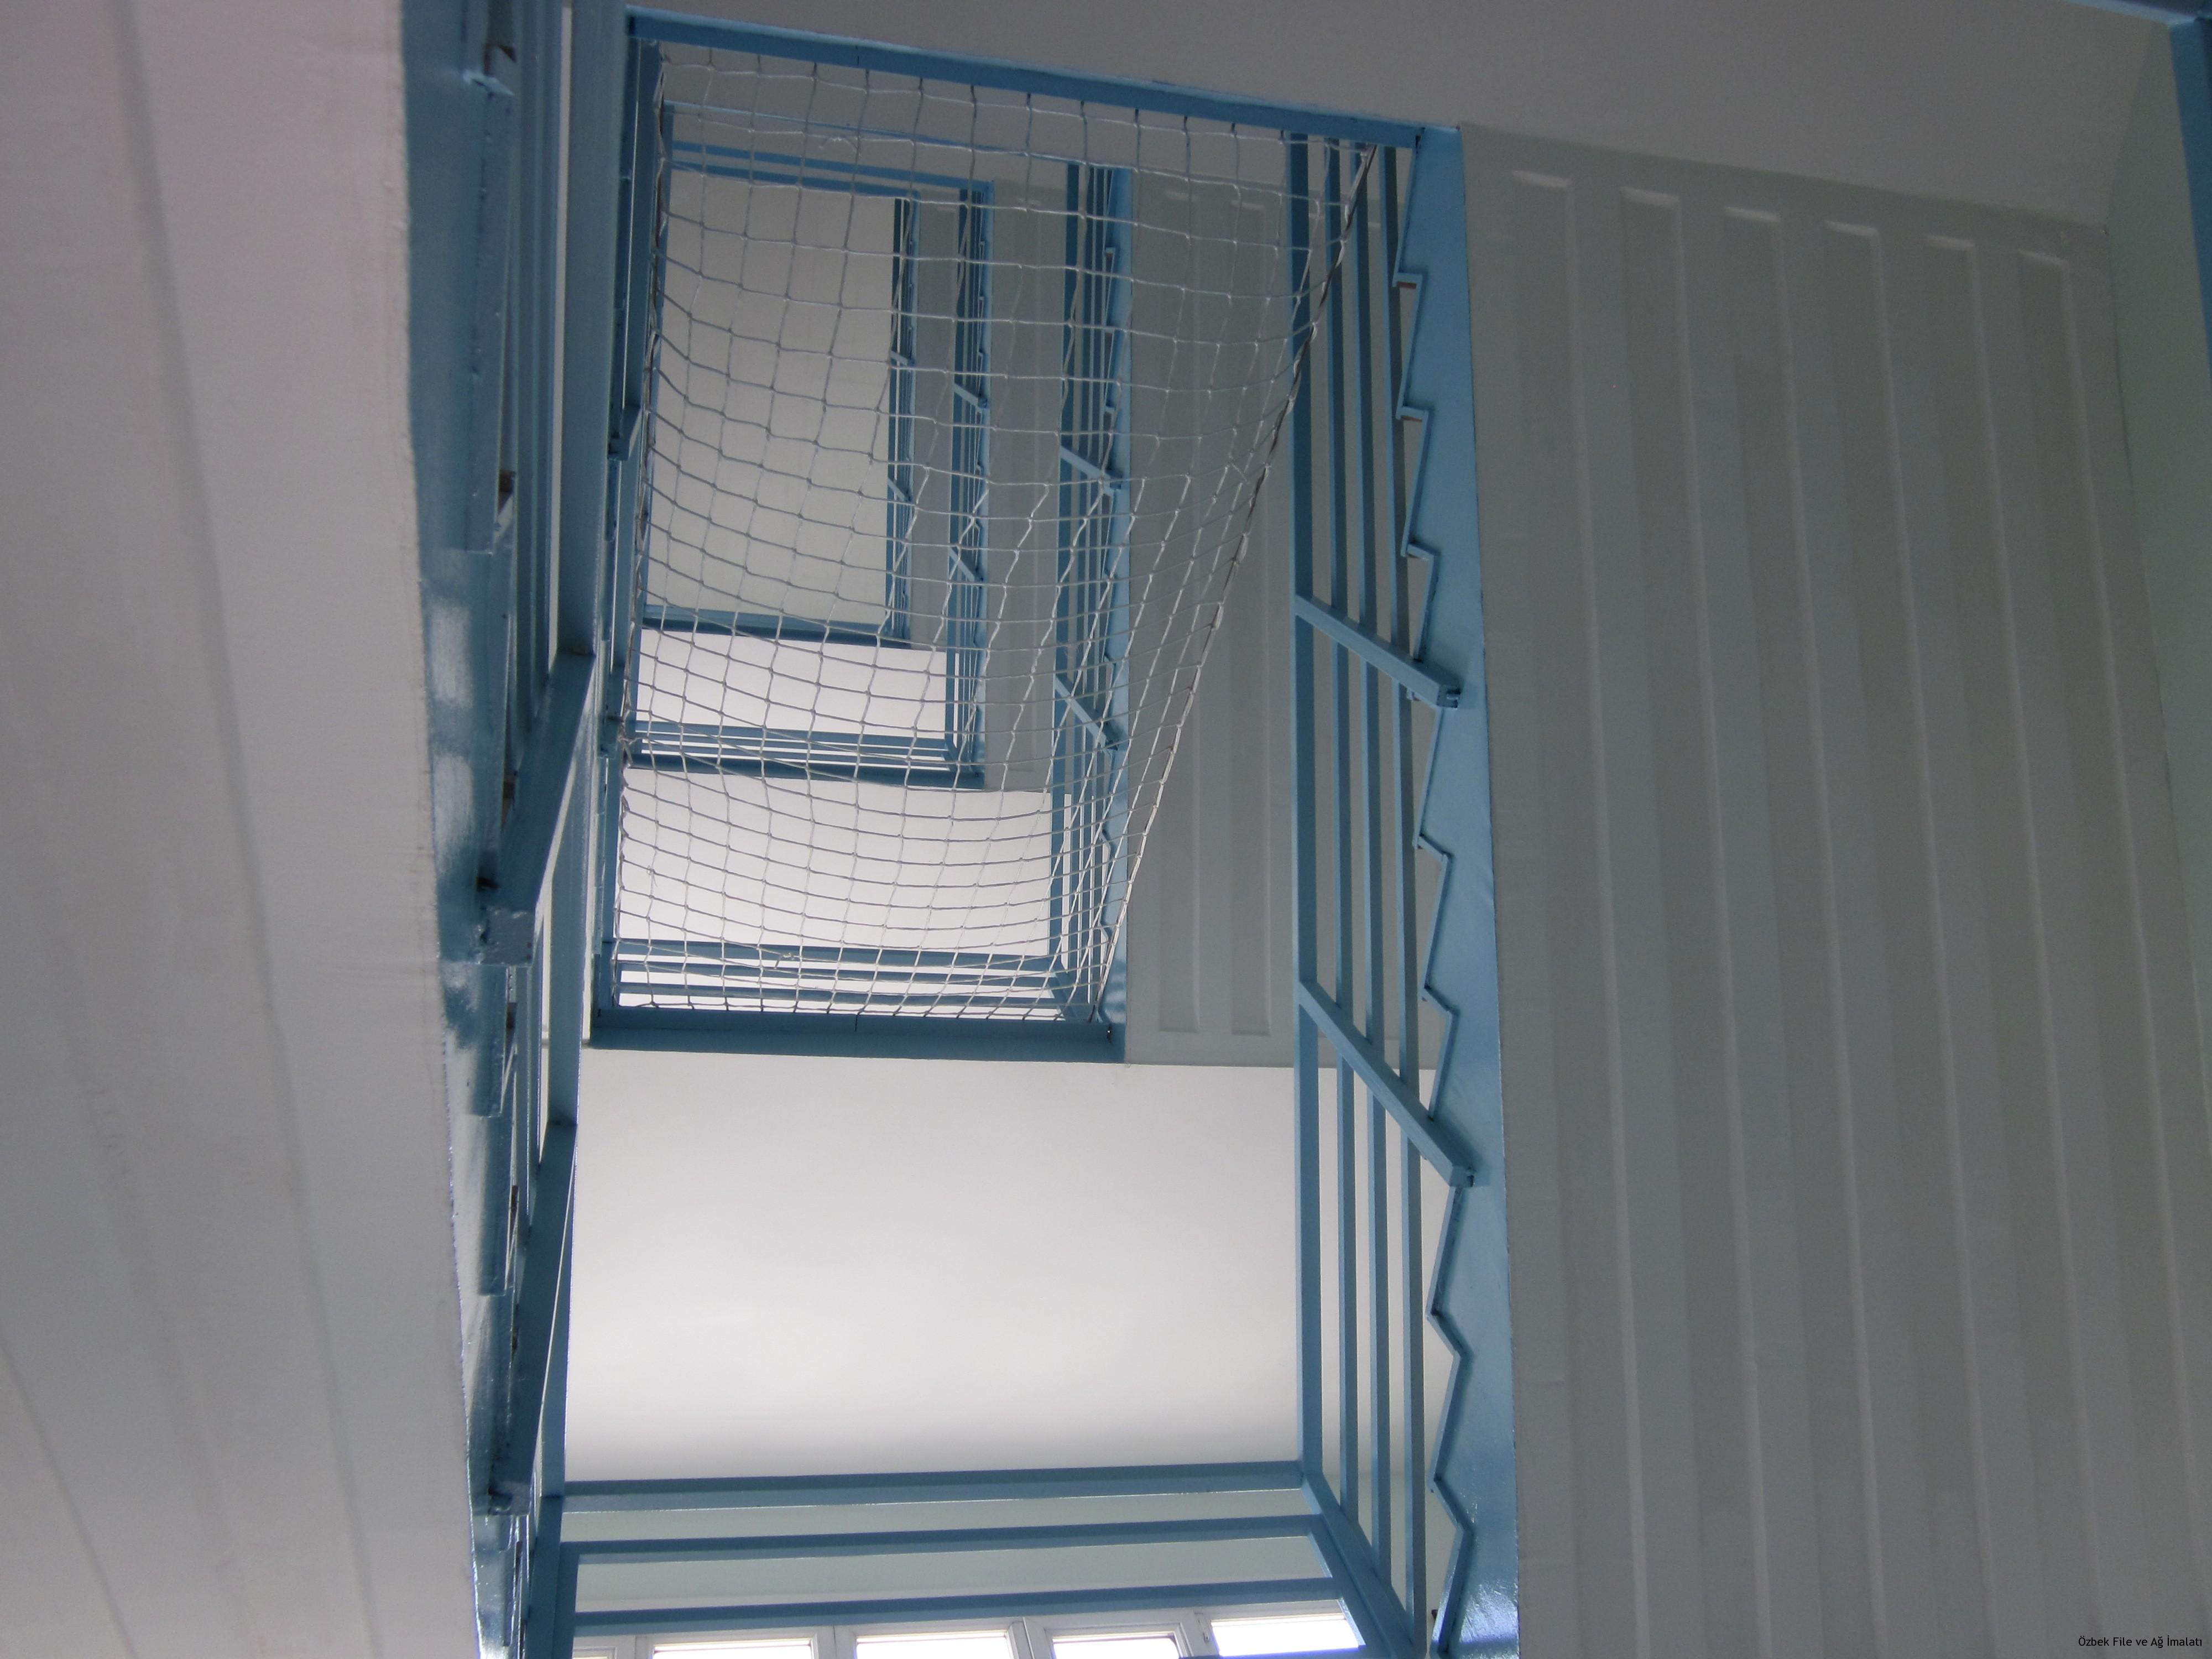 Inşaat merdiven boşluk emniyet filesi